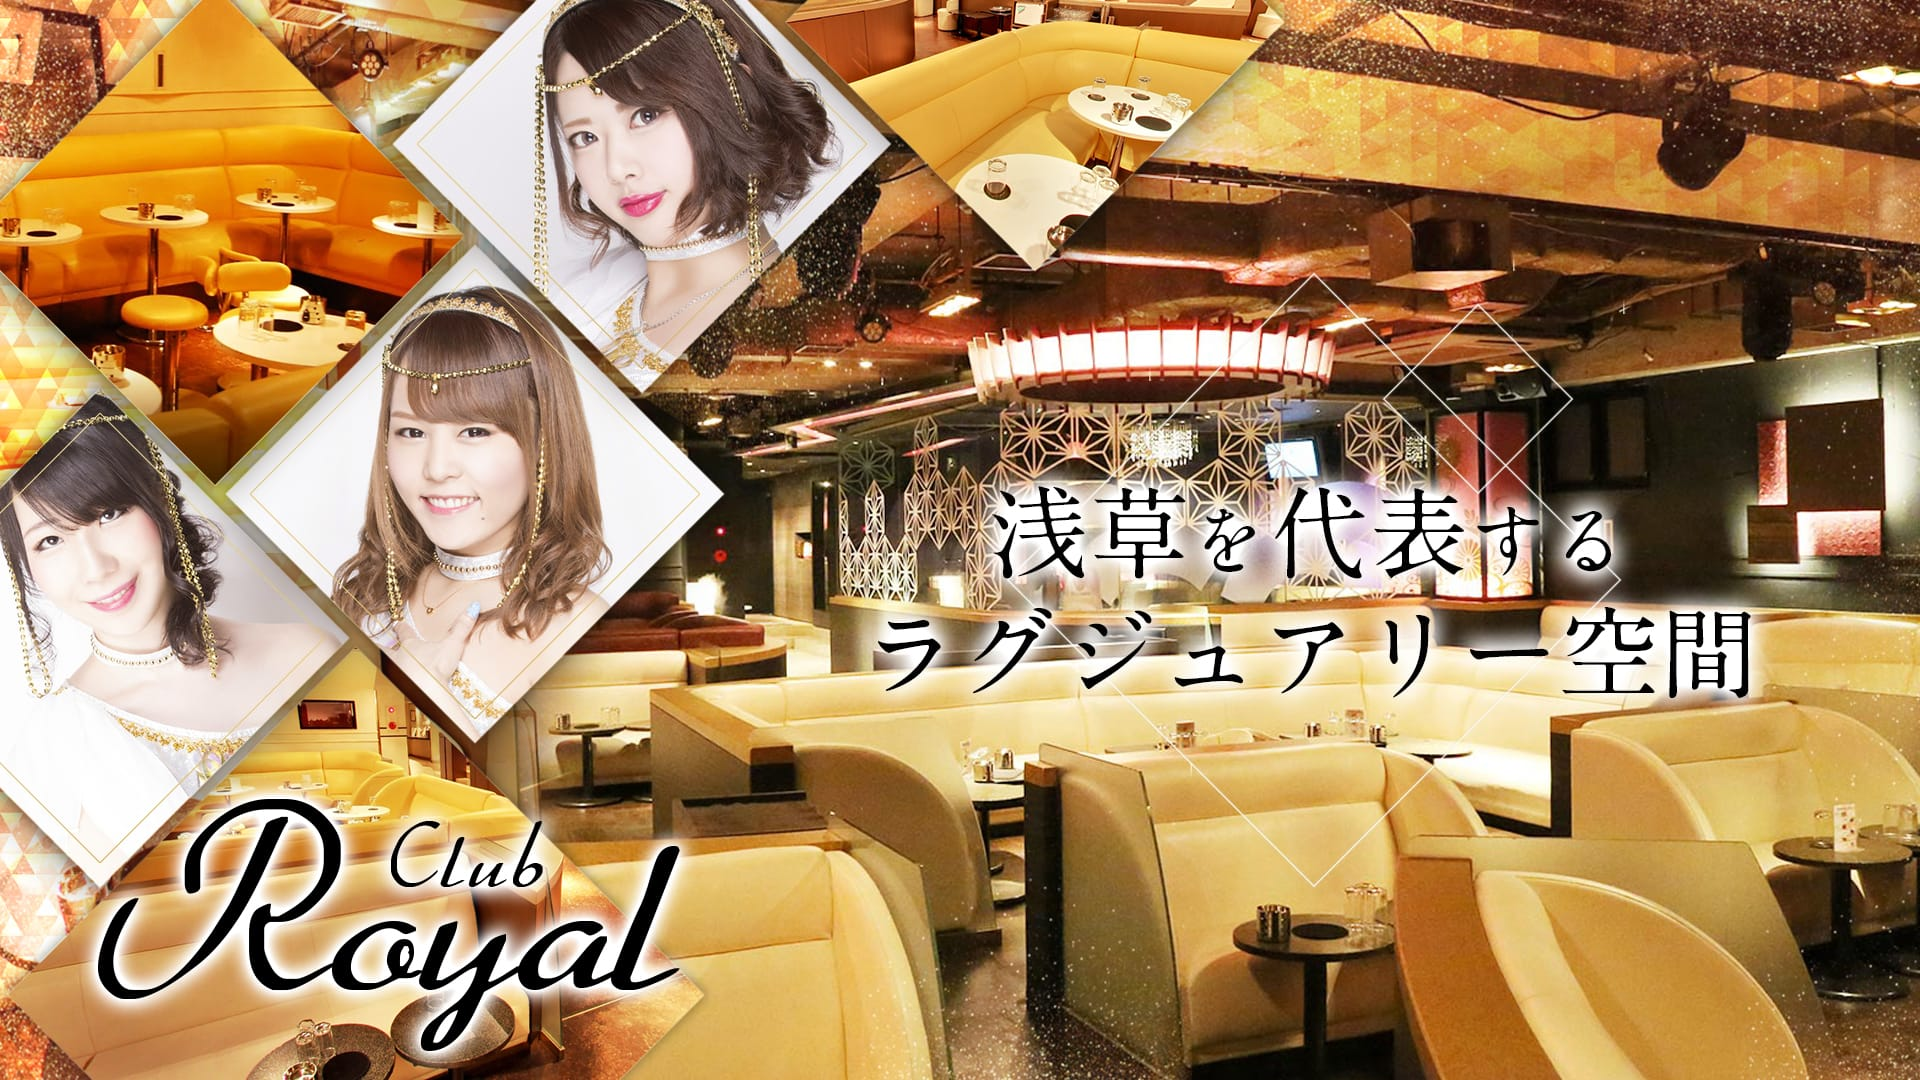 CLUB Royal[クラブ ロイヤル] TOP画像